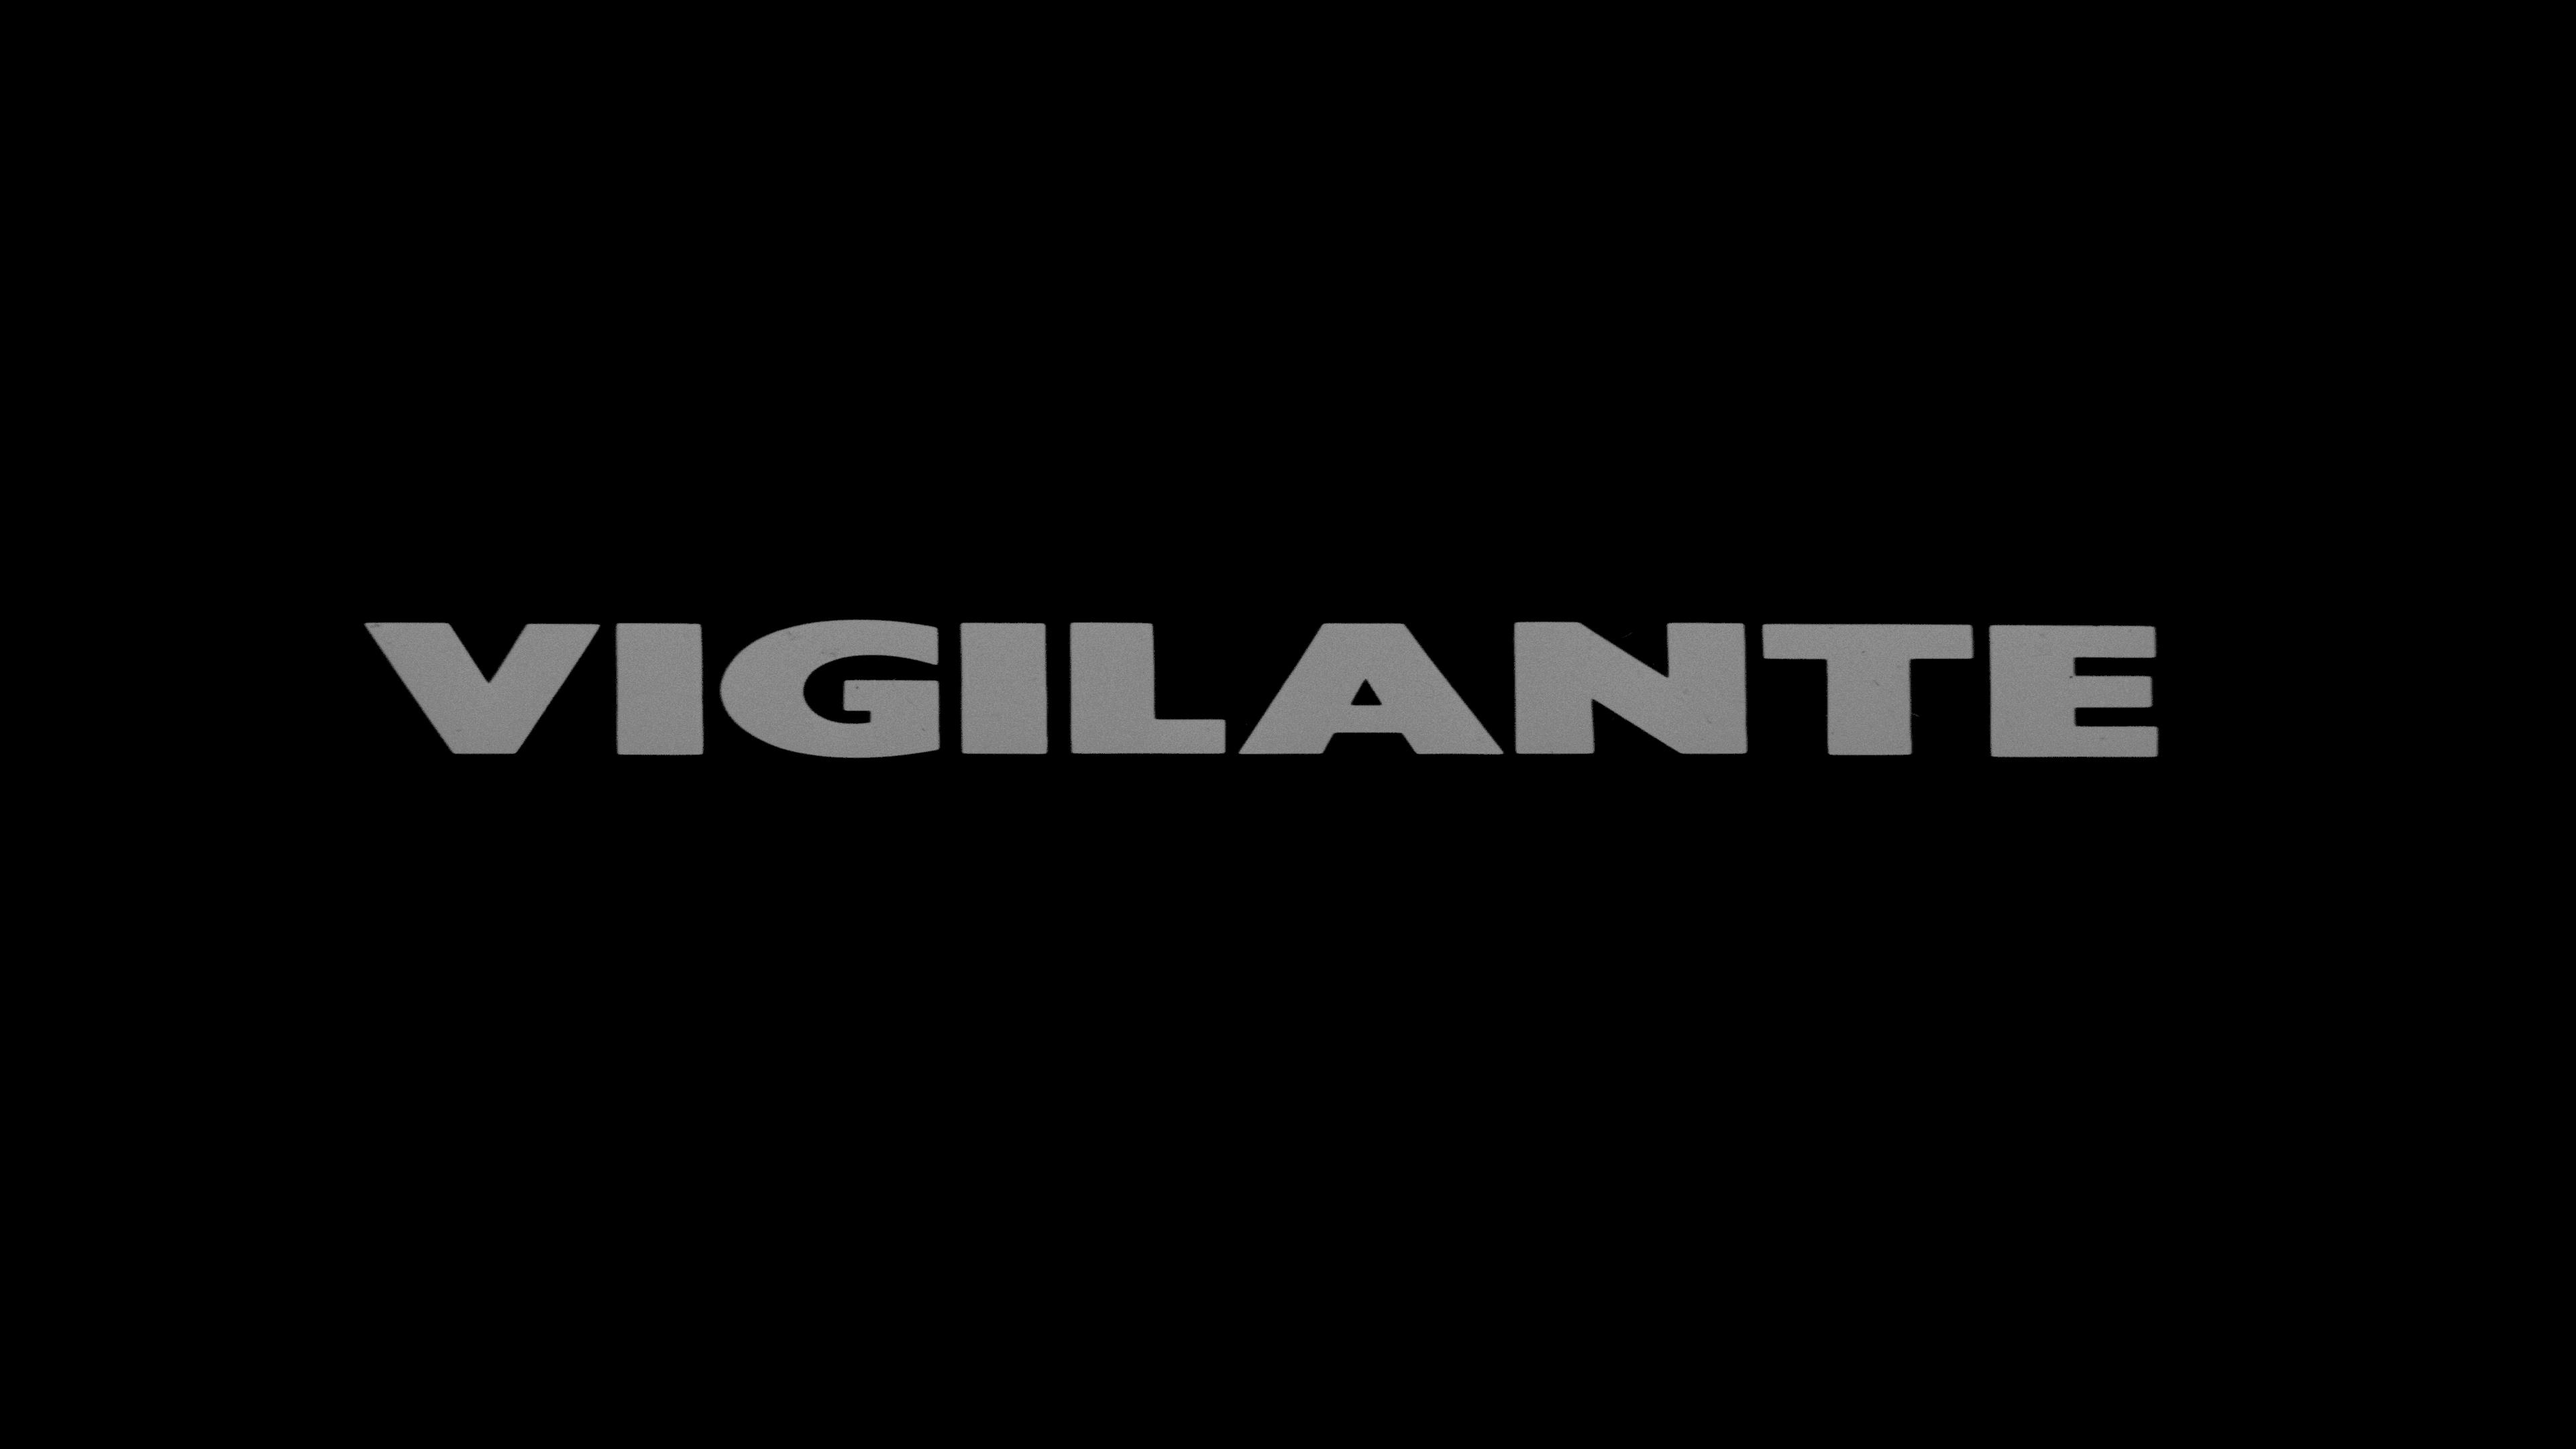 vigilante 4K UHD TITLE